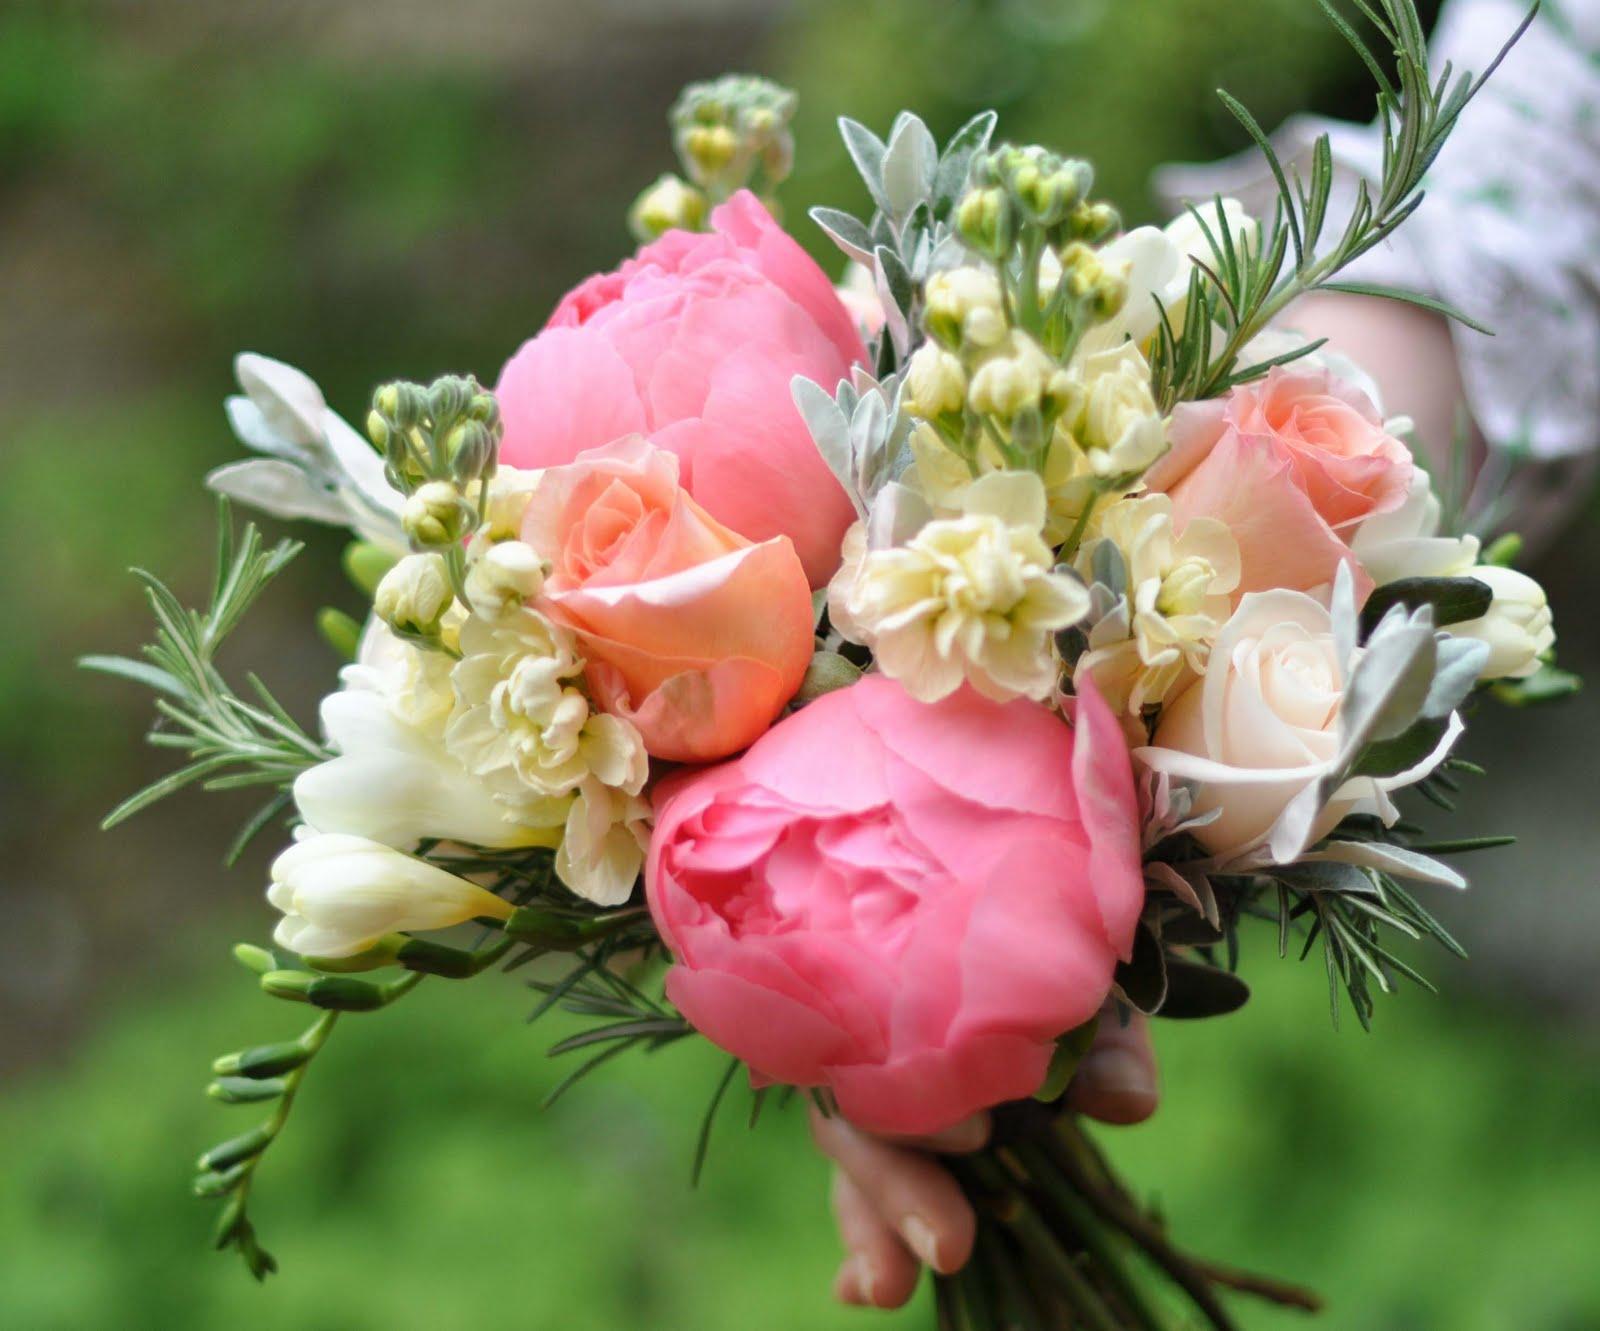 spriggs florist peony coral charm sweet peas delphiniums